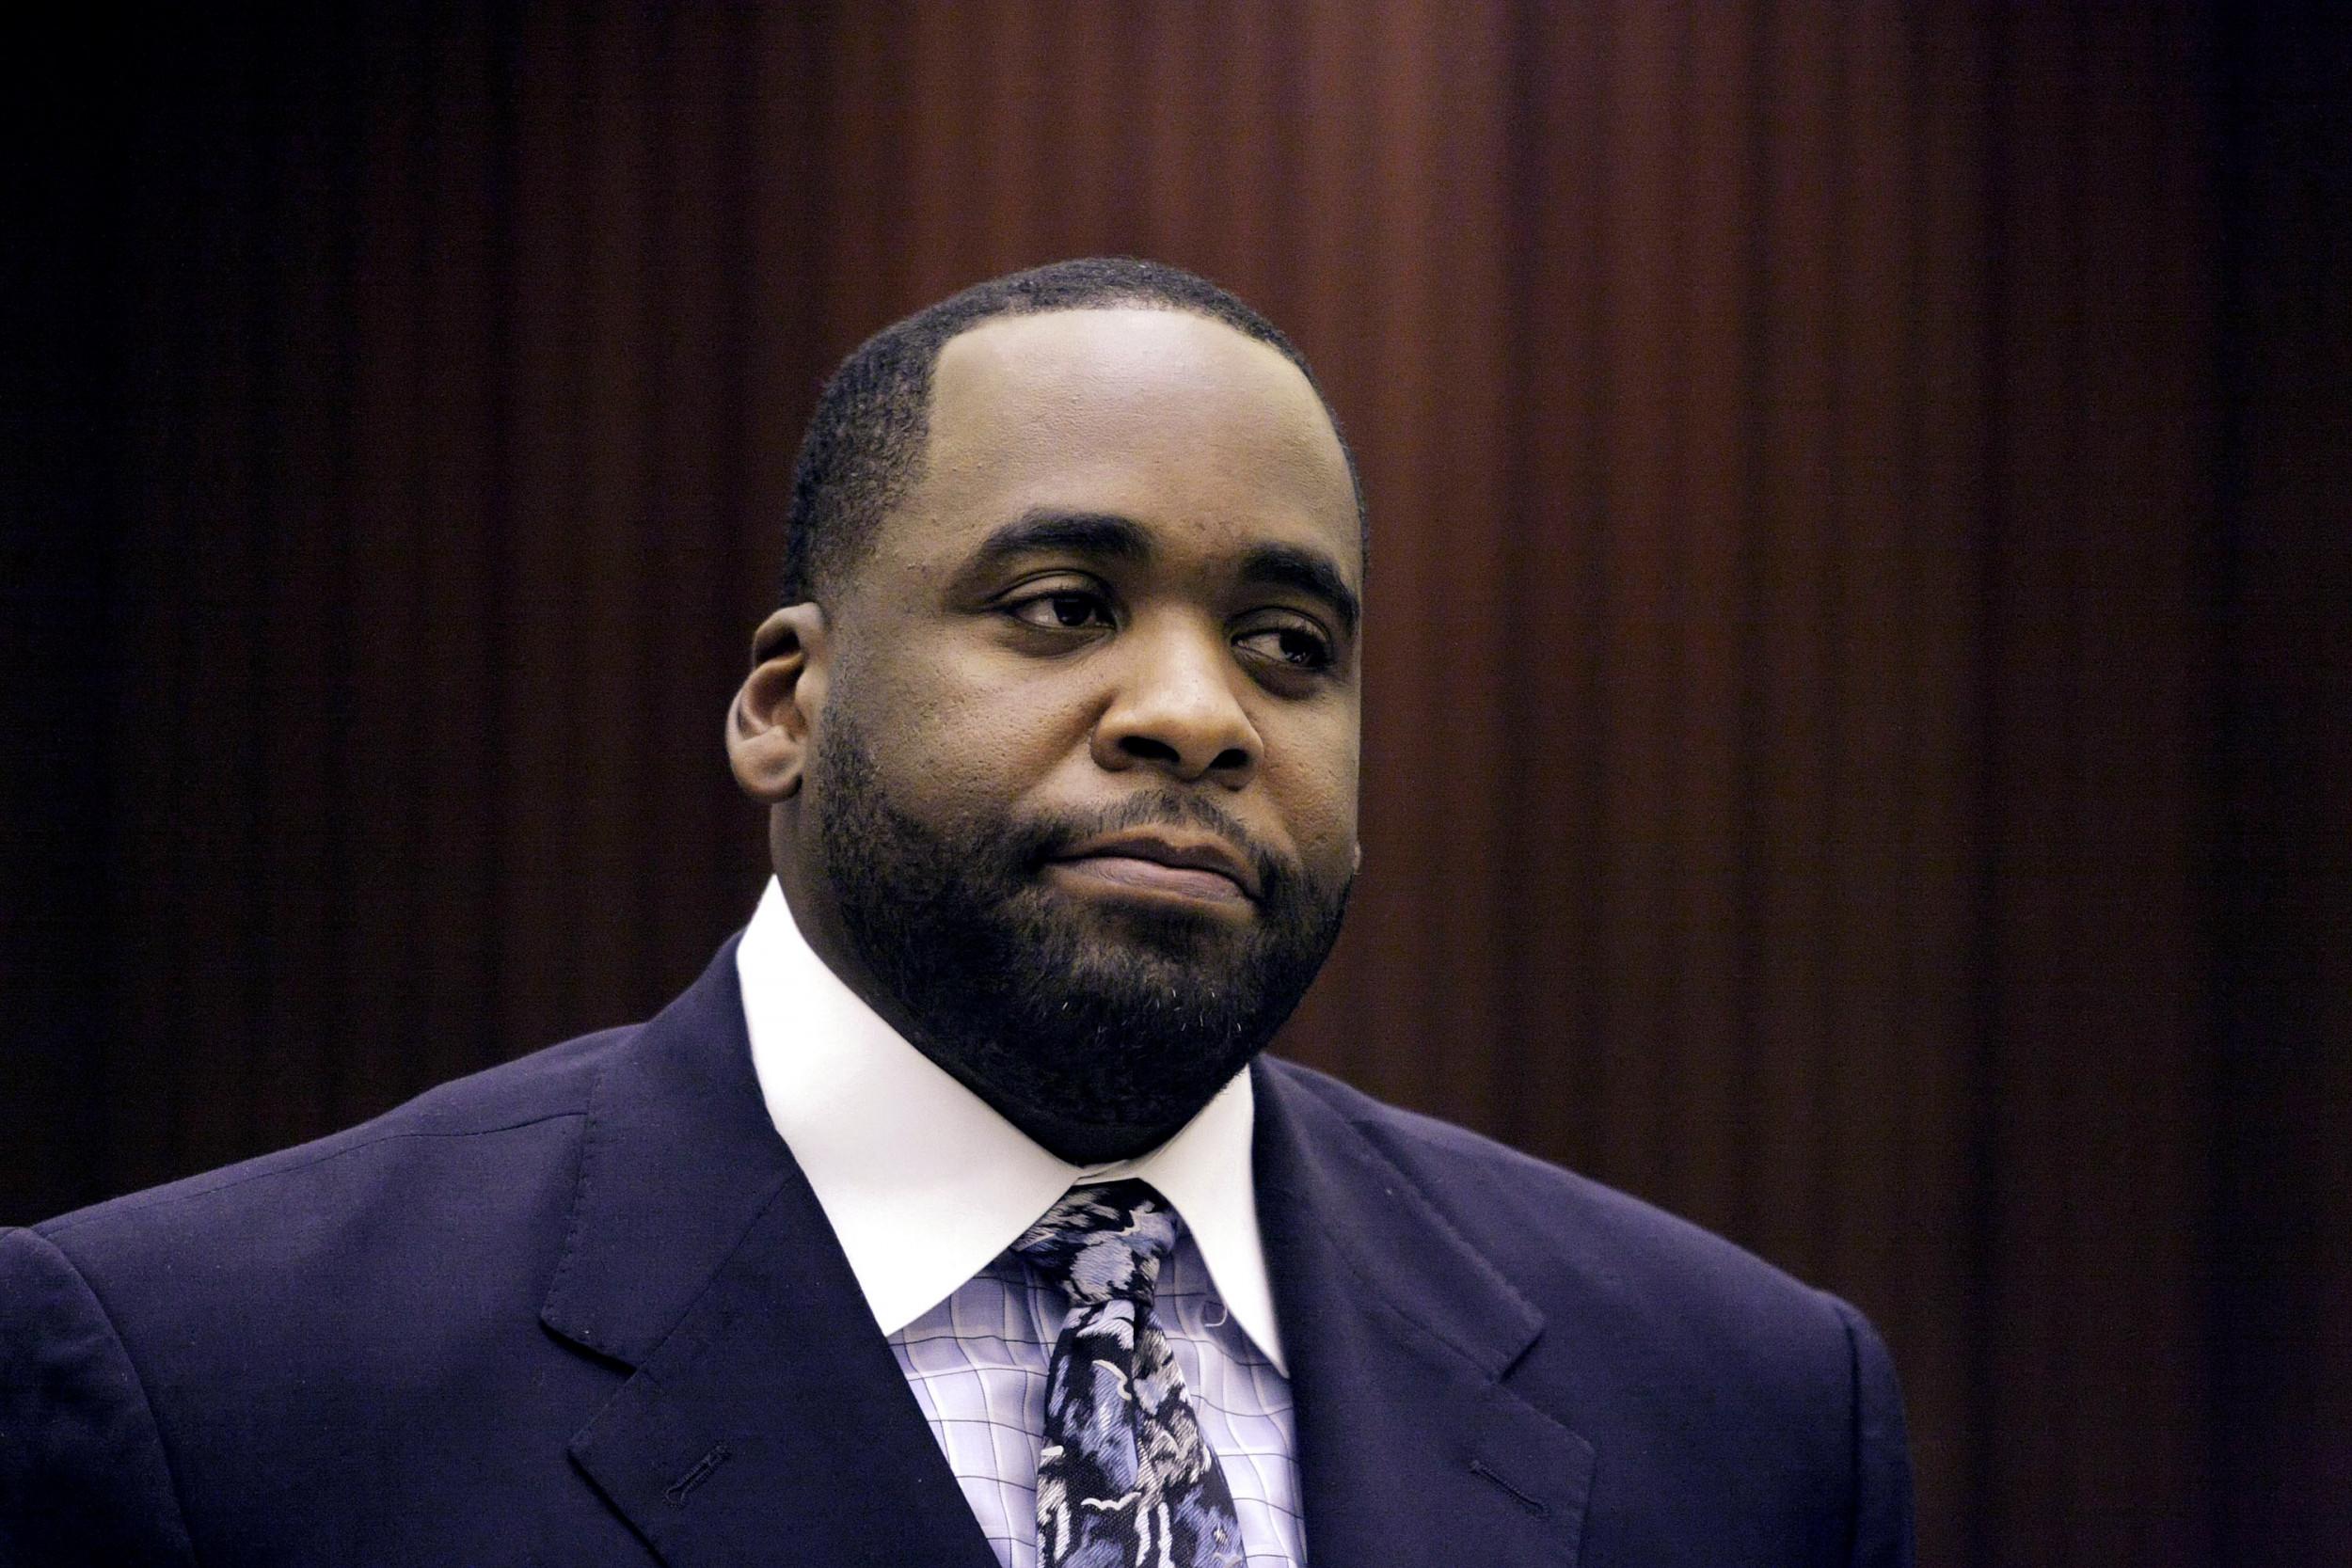 Former Detroit Mayor to Stay in Prison Despite...